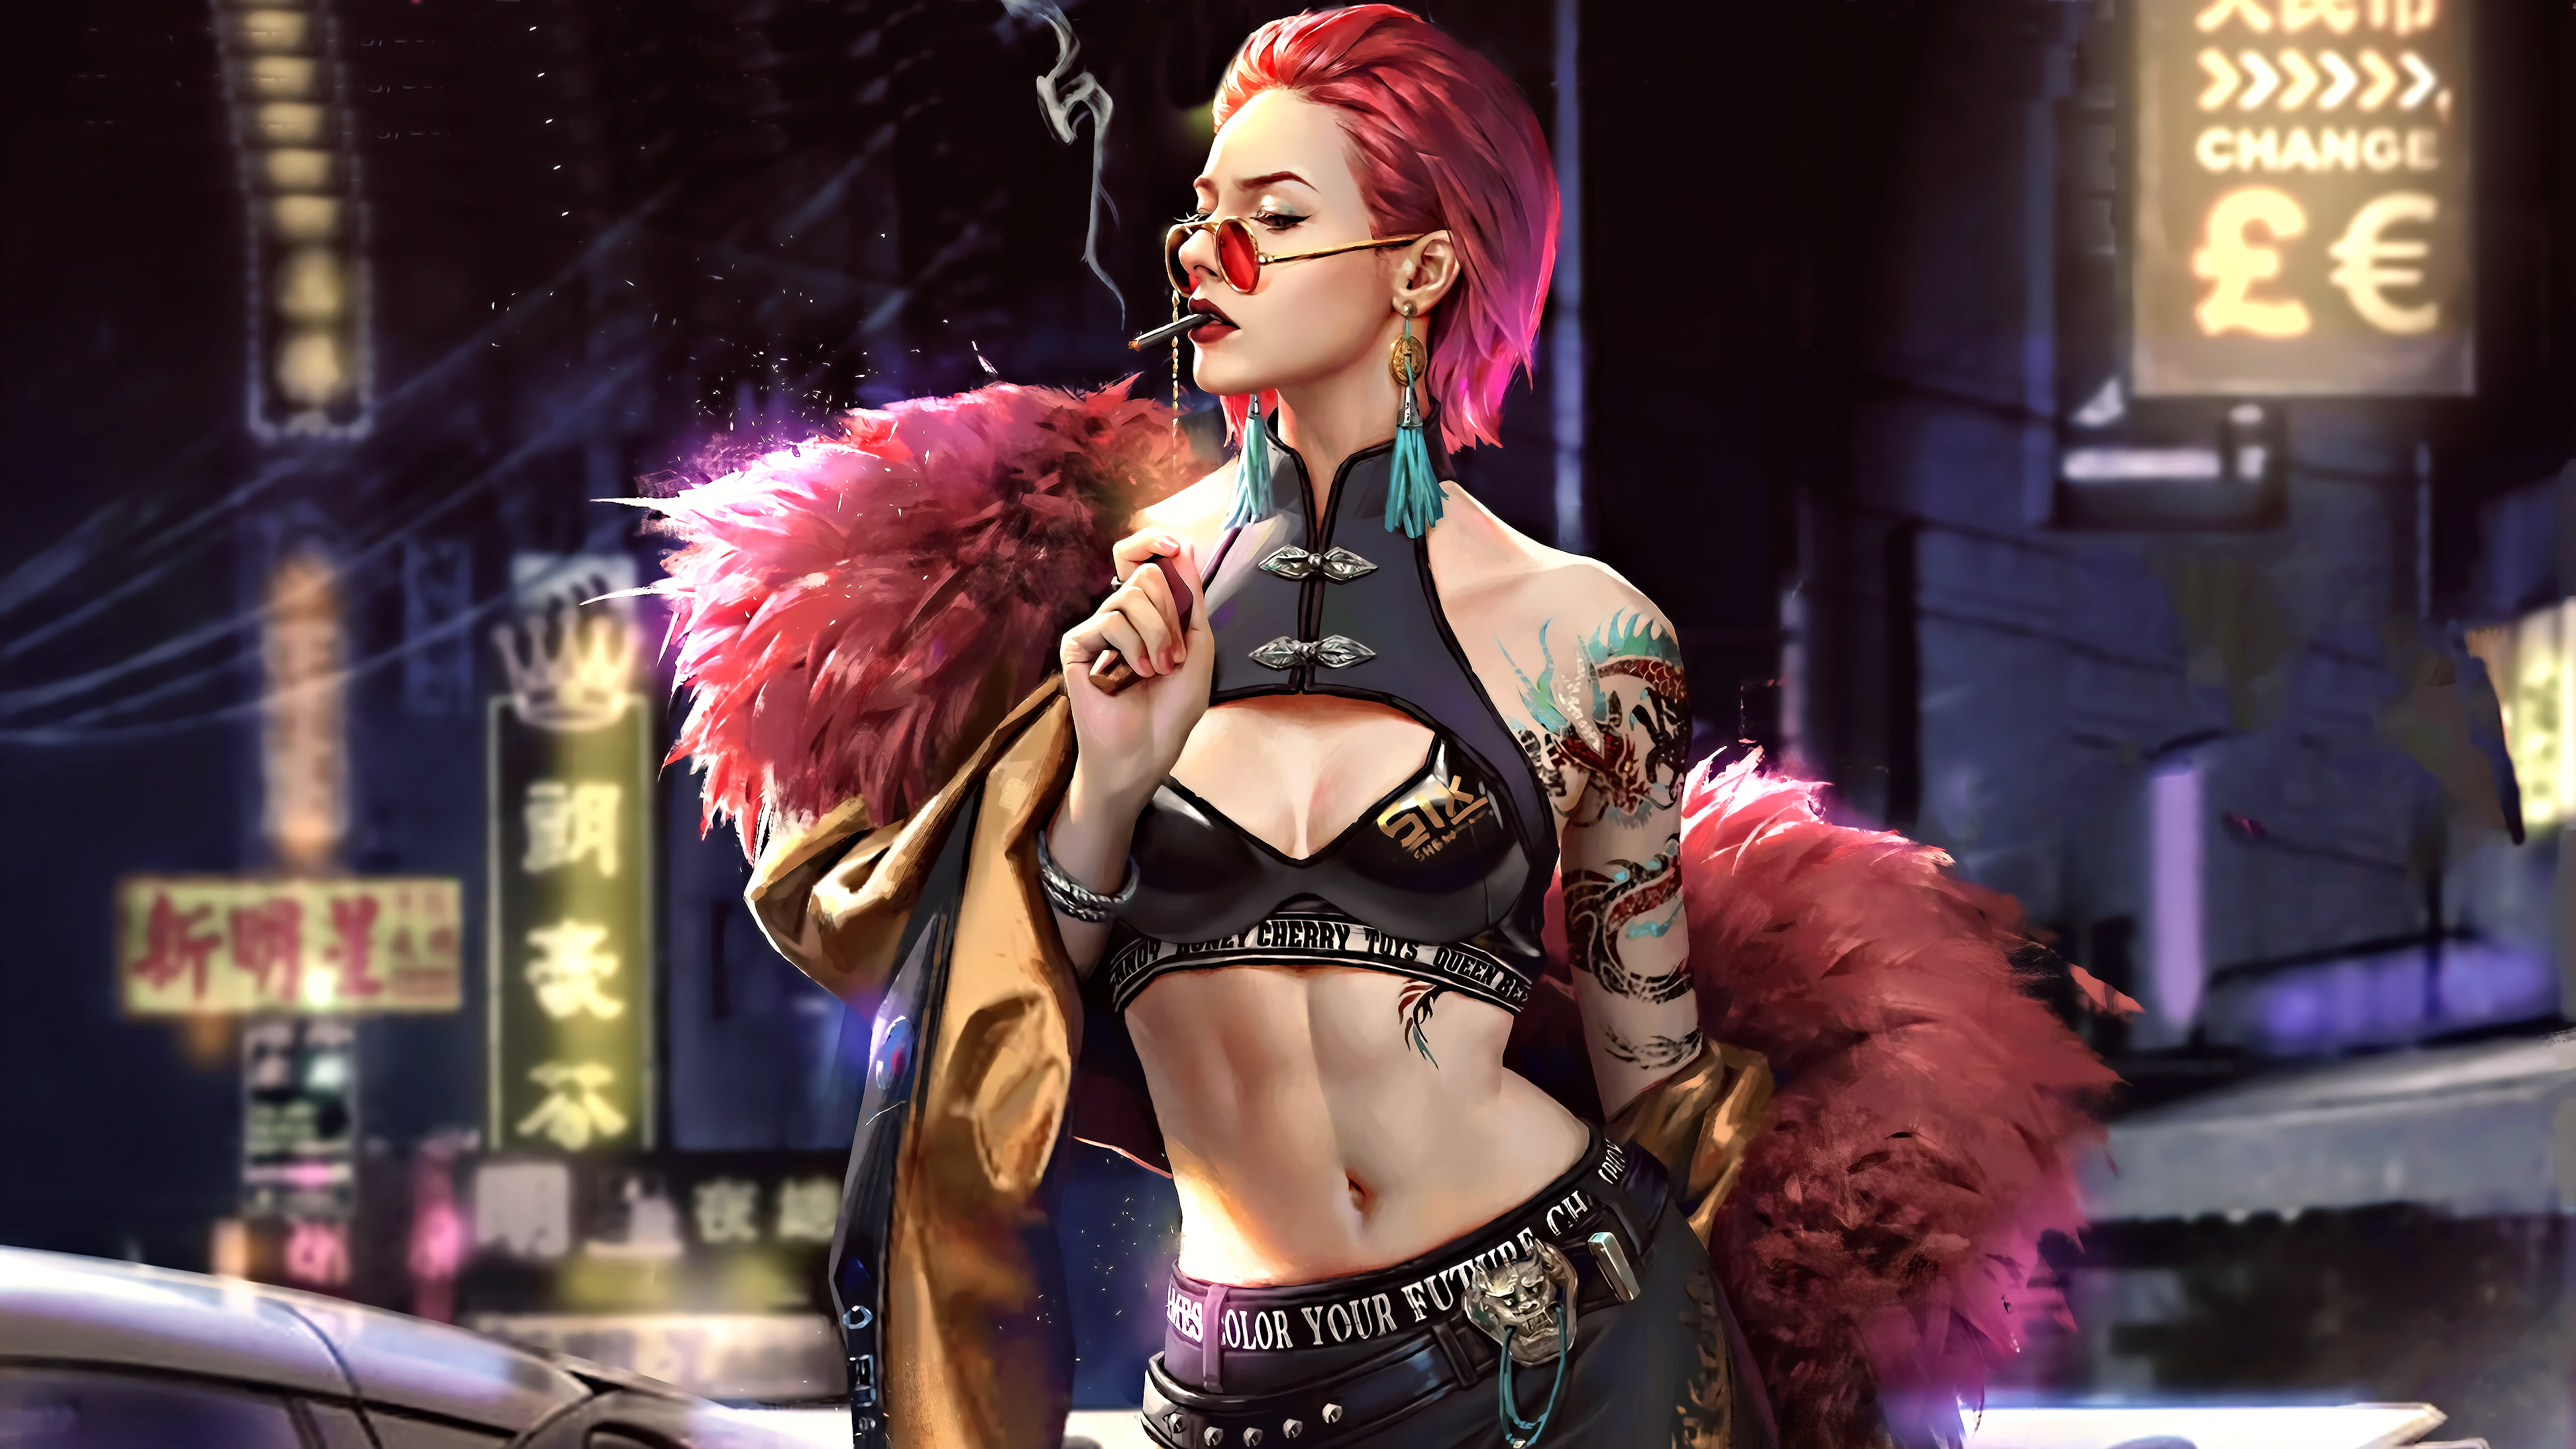 General 3840x2160 science fiction digital art concept art artwork futuristic fantasy art fan art 3D CGI cyberpunk cyber women city fantasy girl